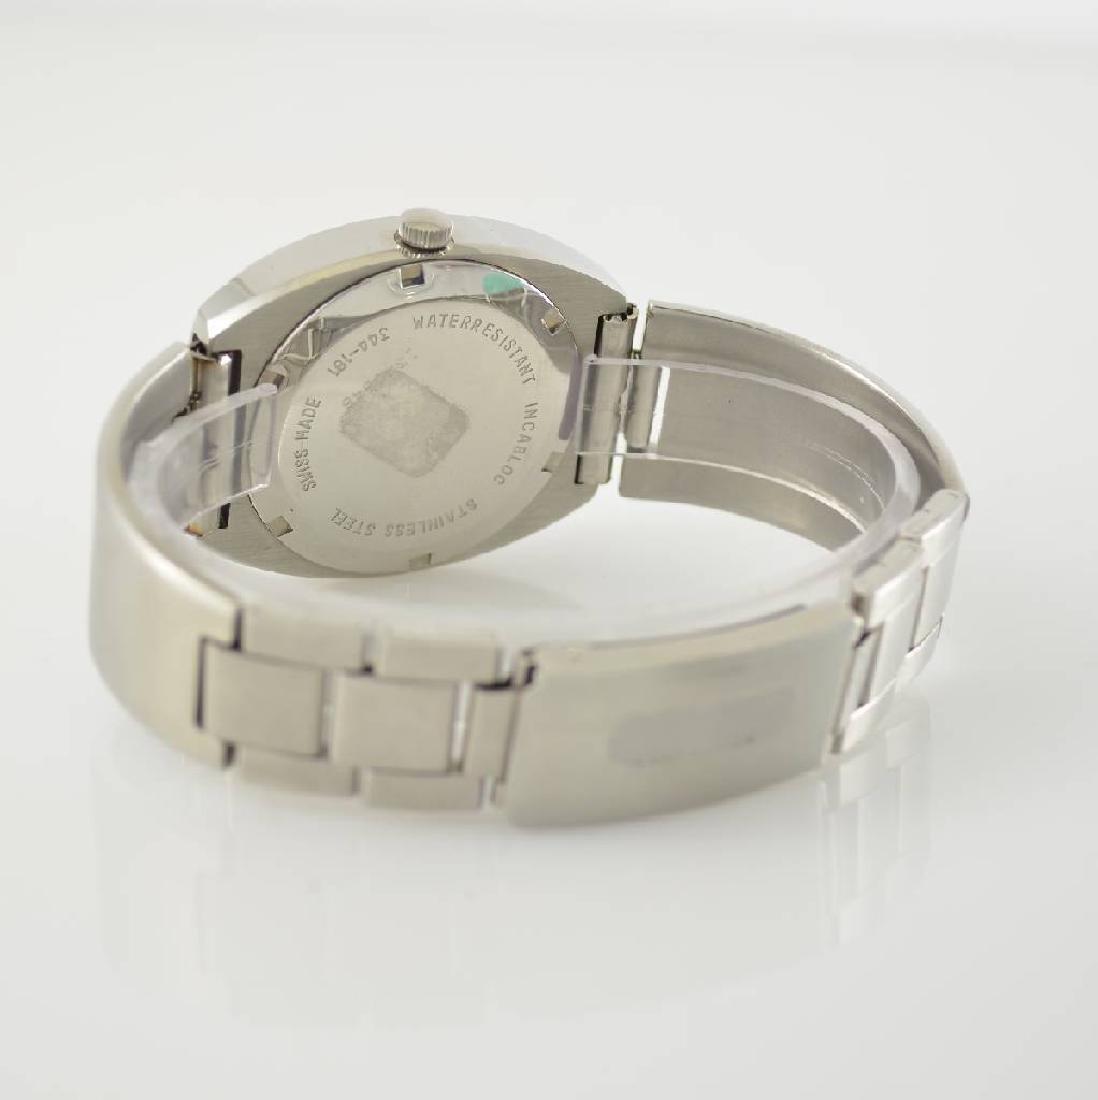 GLYCINE High Frequency gents wristwatch - 5